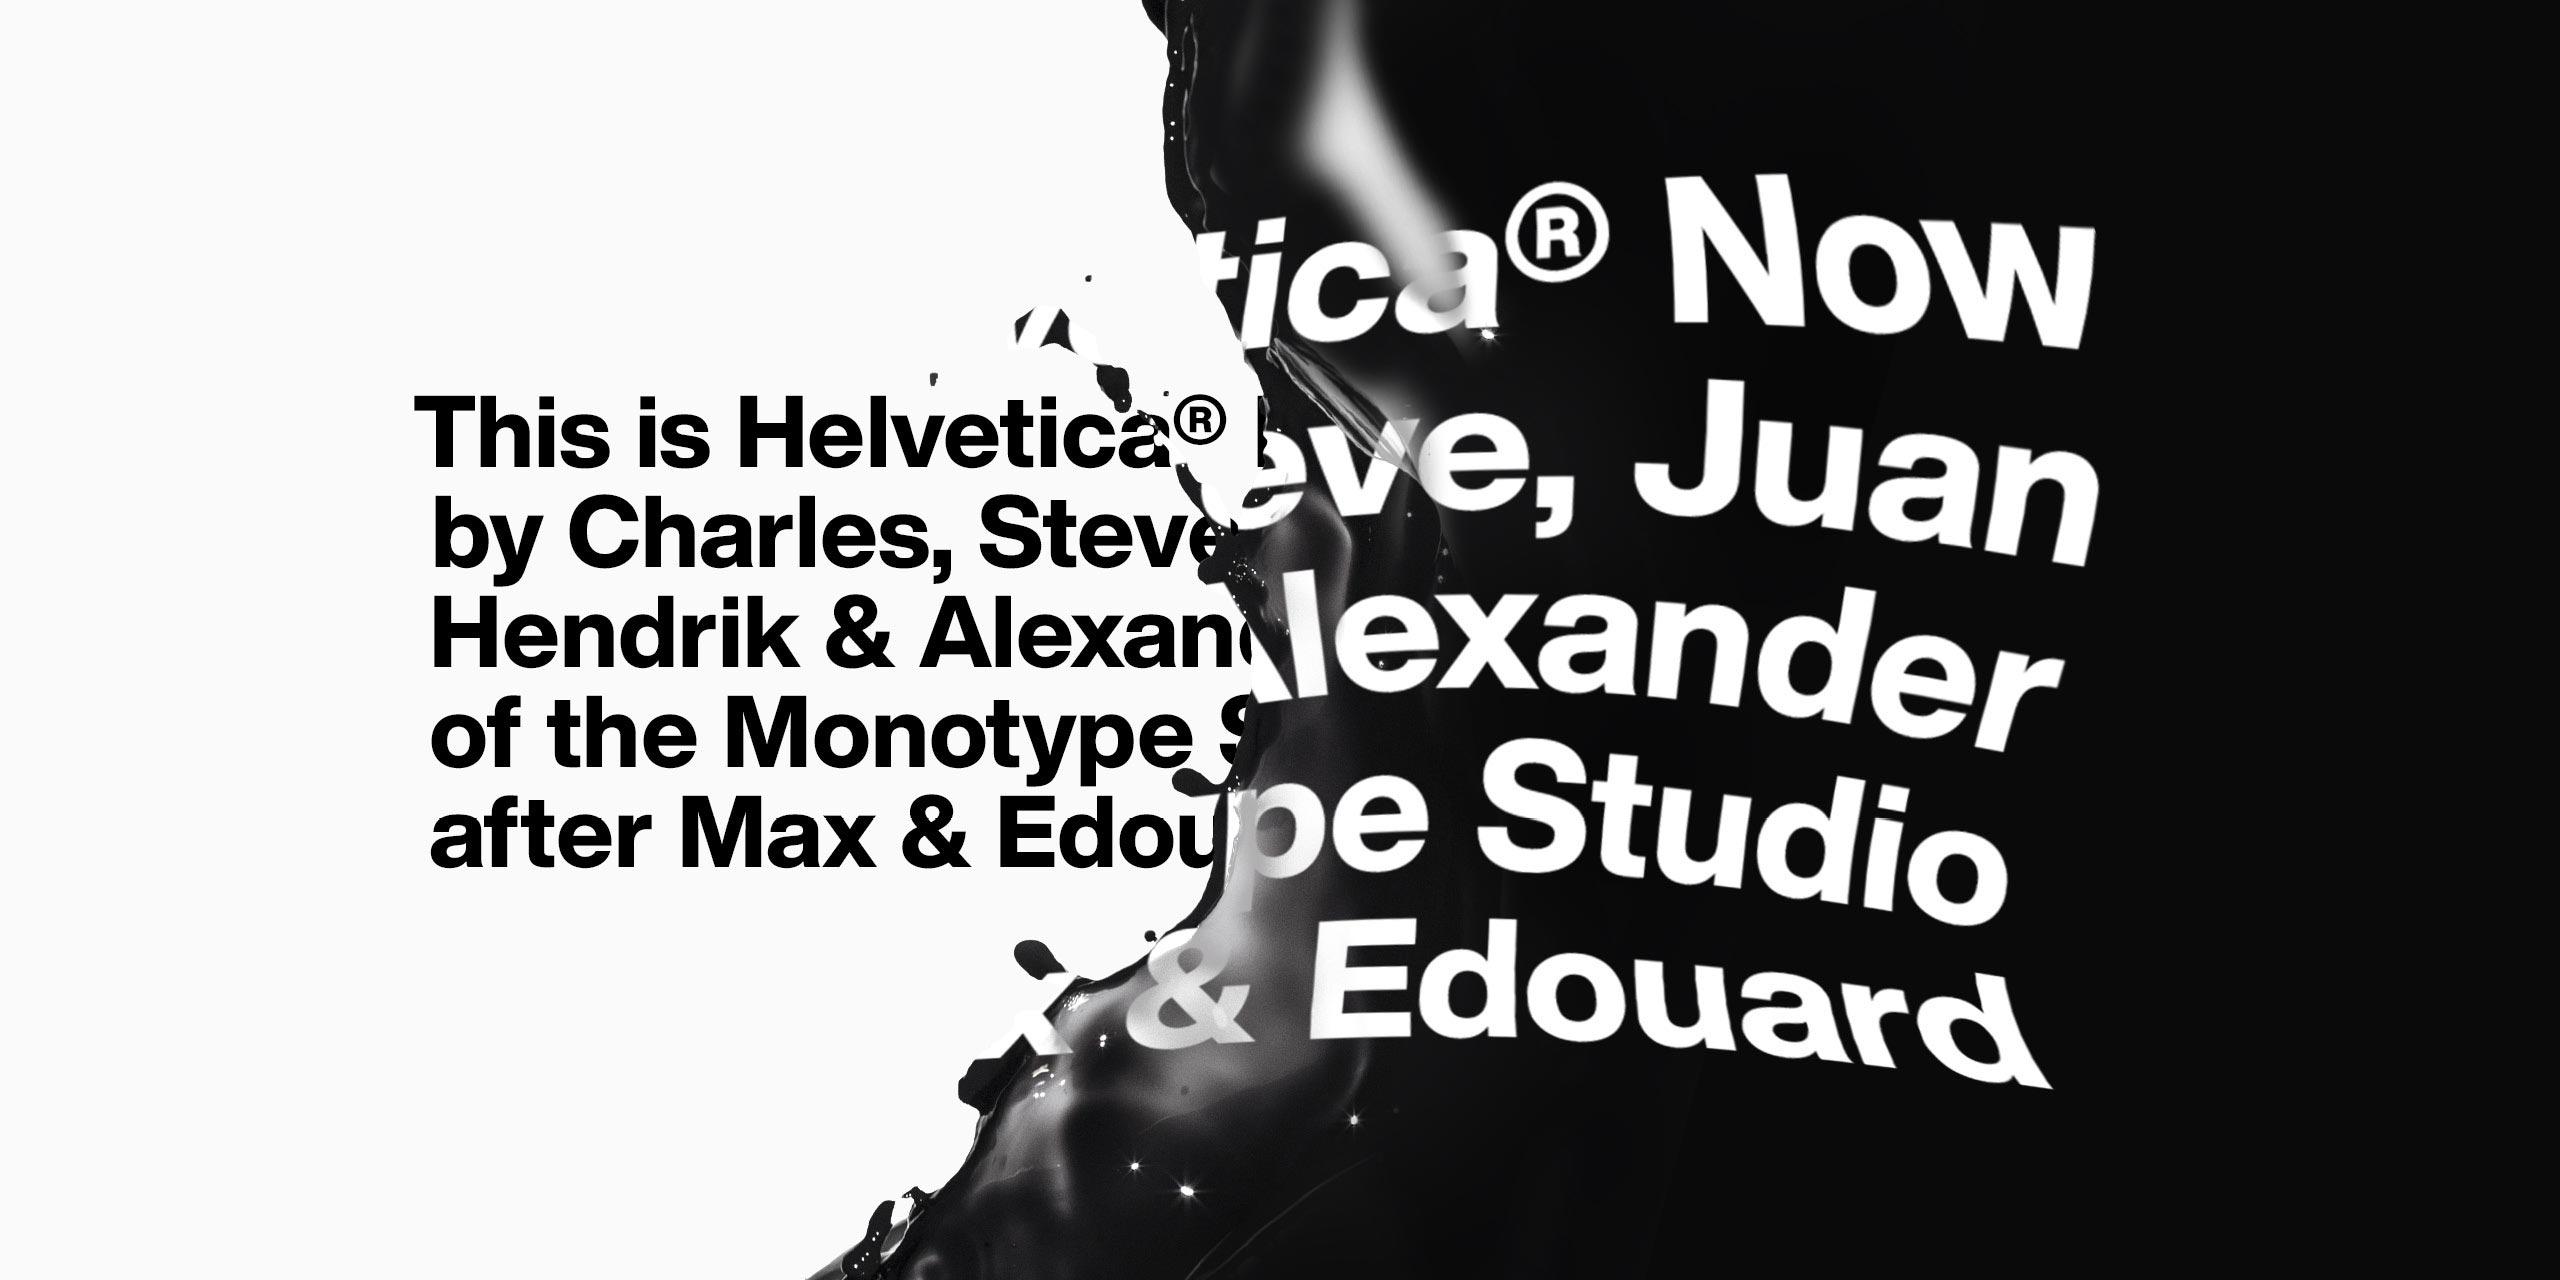 I nuovi caratteri del font Helvetica Now